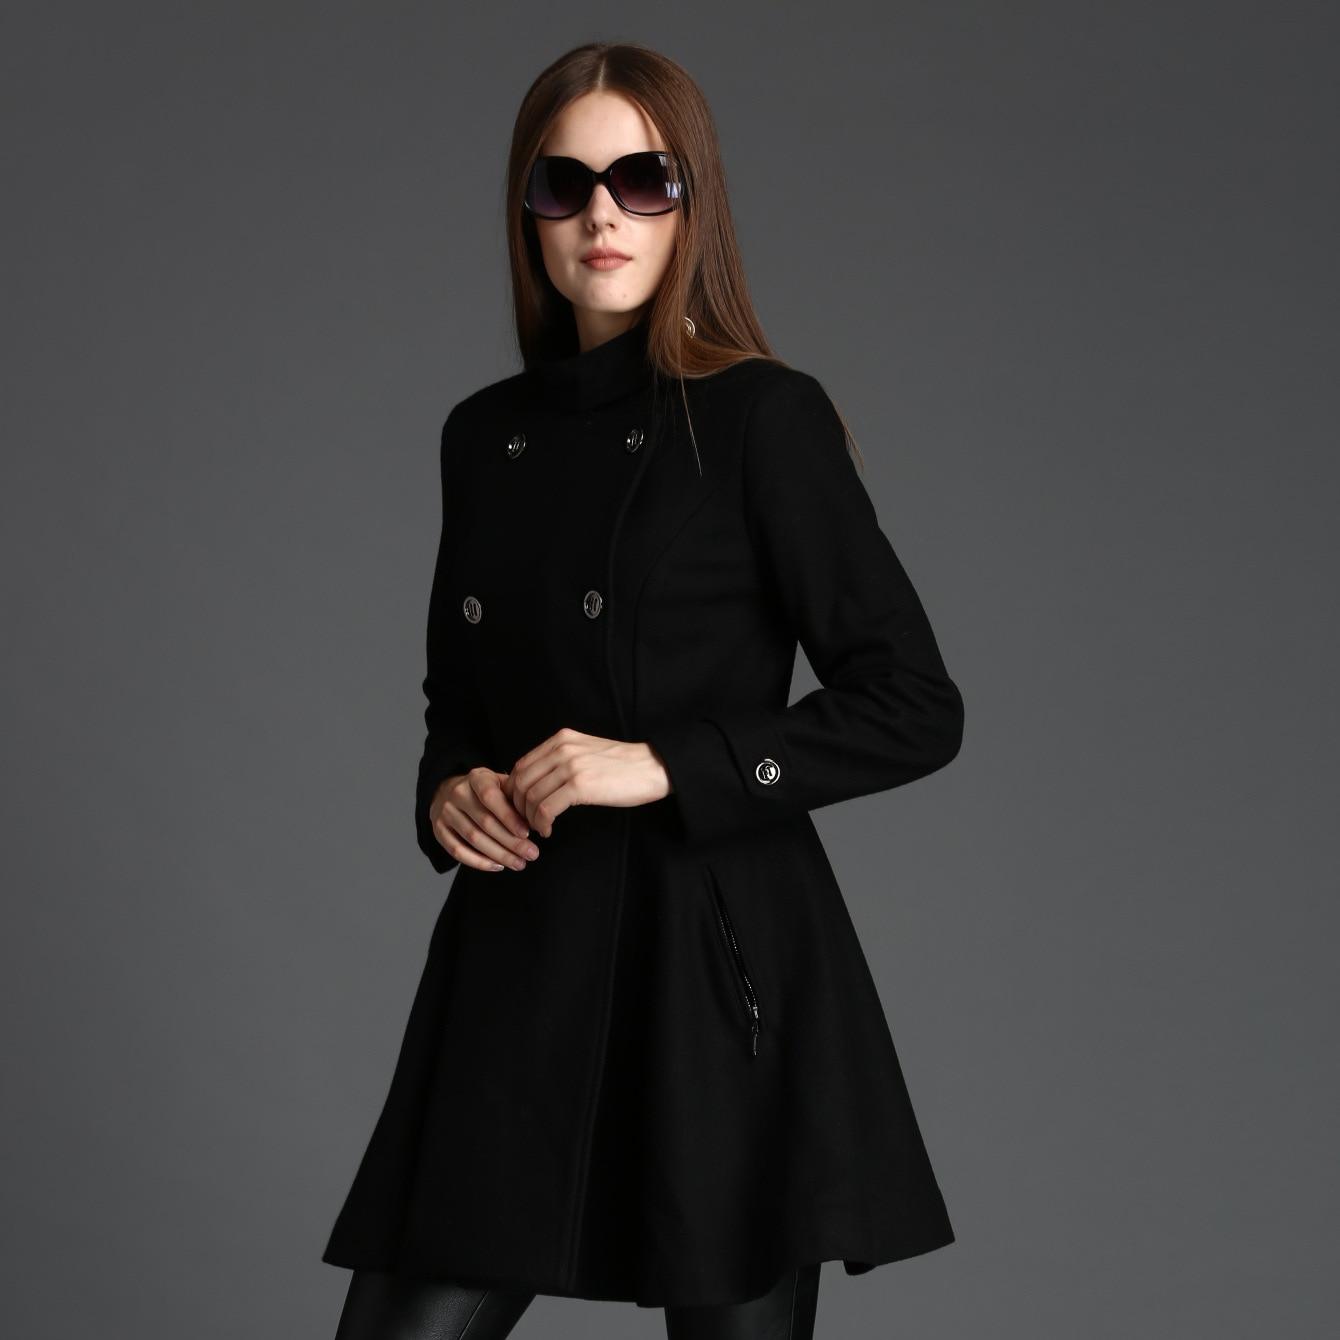 Aliexpress.com : Buy 2016 Classic Fit Winter Black Wool Skater ...